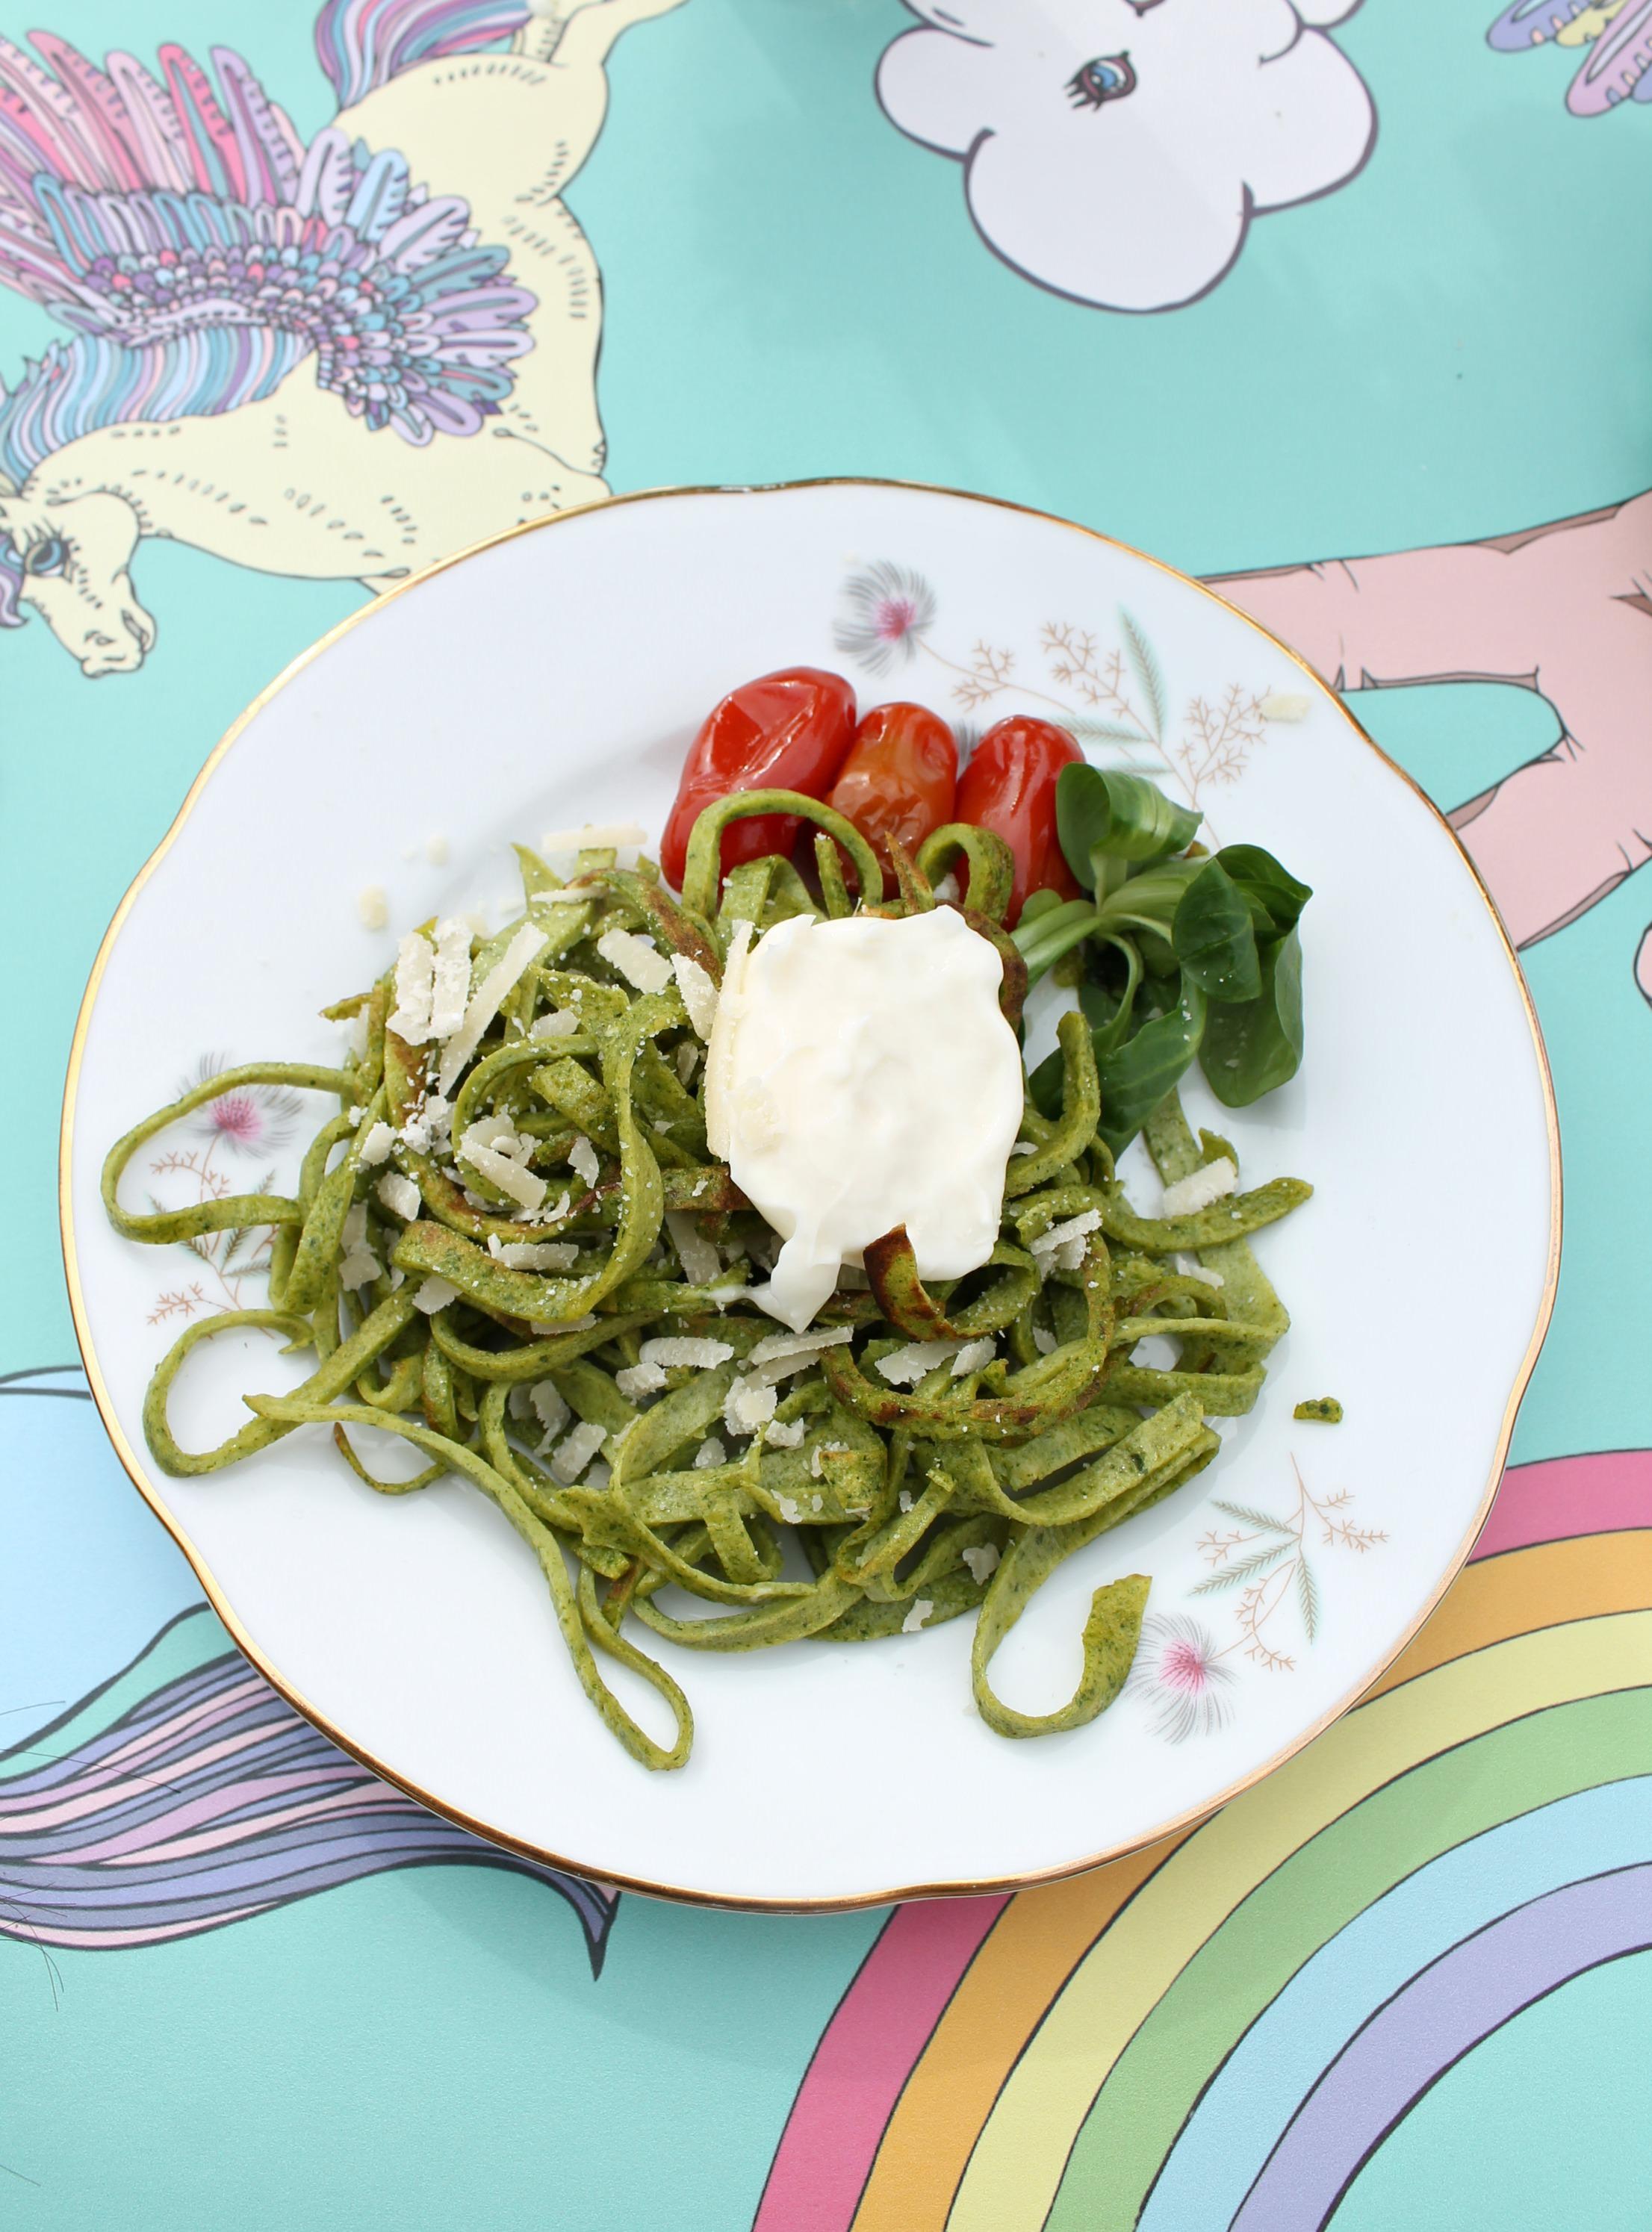 Frittata-di-Riccioli-by-Symmetry-breakfast-and-Tini-Ferragamo-photo-by-Little-Big-Bell